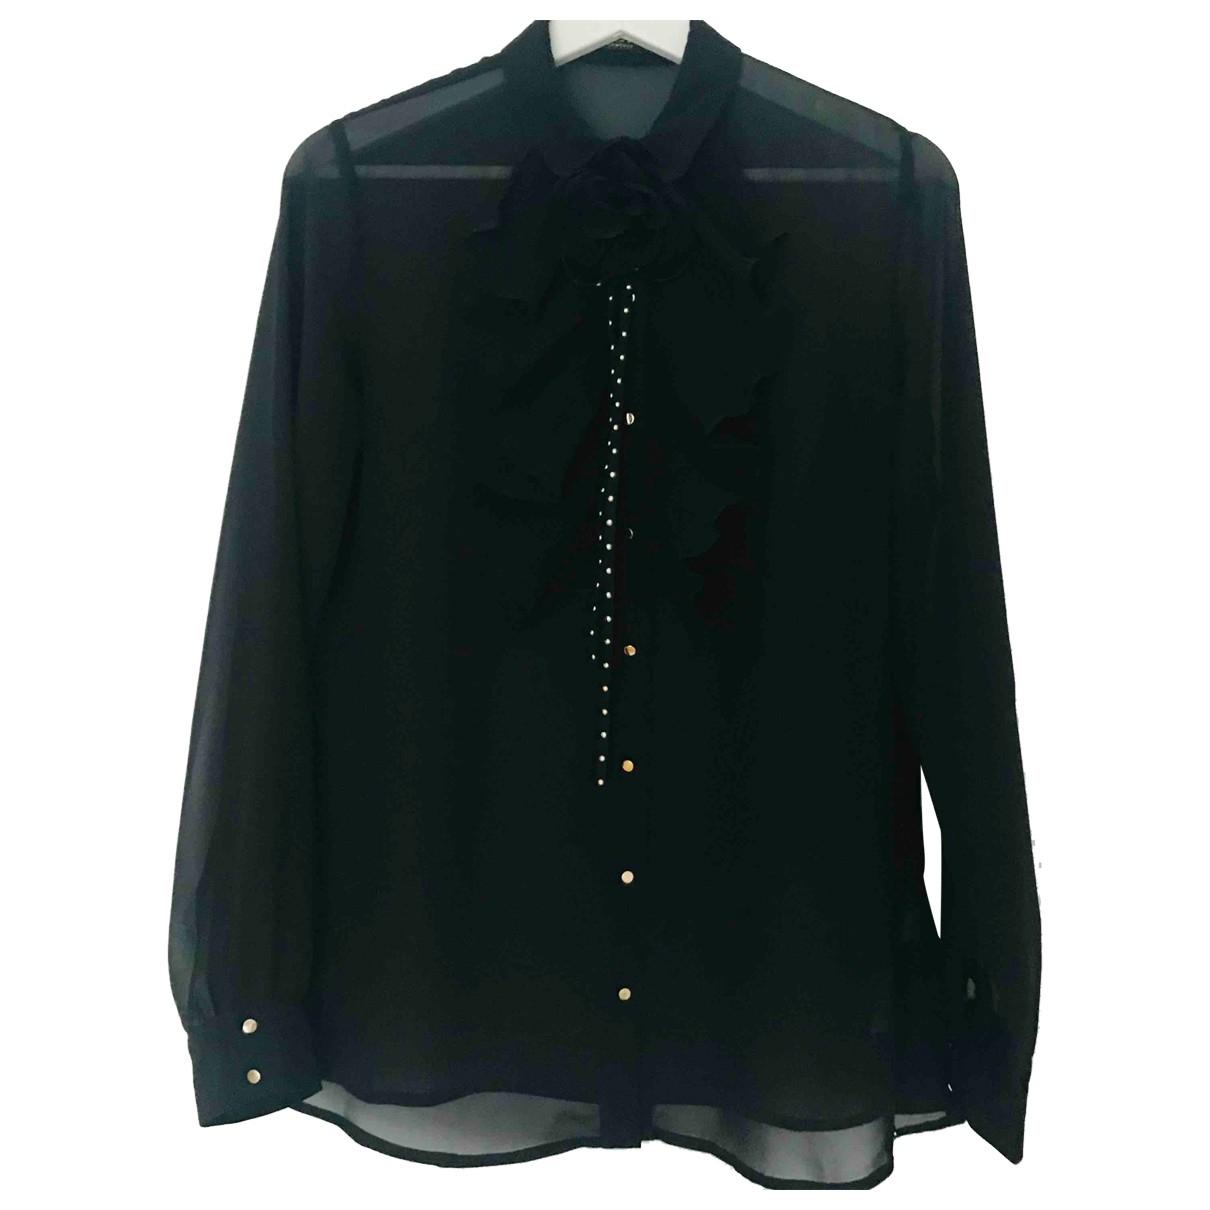 Guess \N Black  top for Women S International